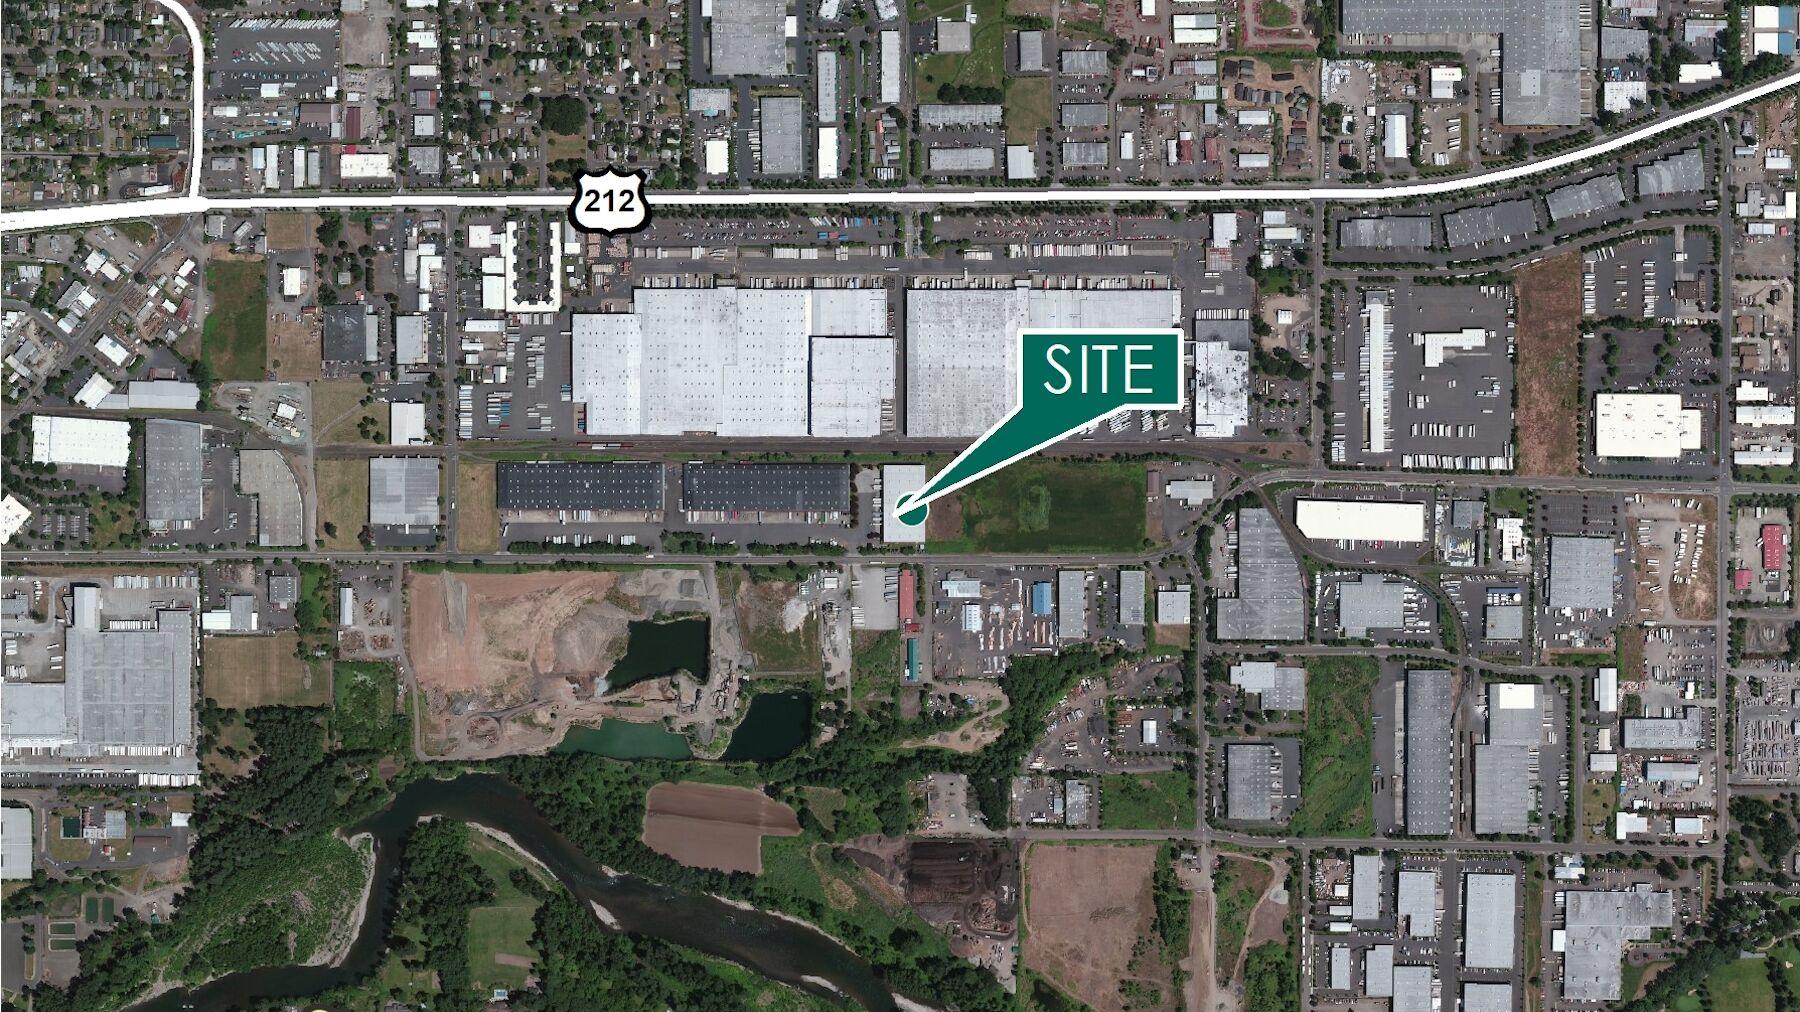 DPM-11401-SE-Jennifer-Street-Flyer-Aerial-3x3-25.jpg